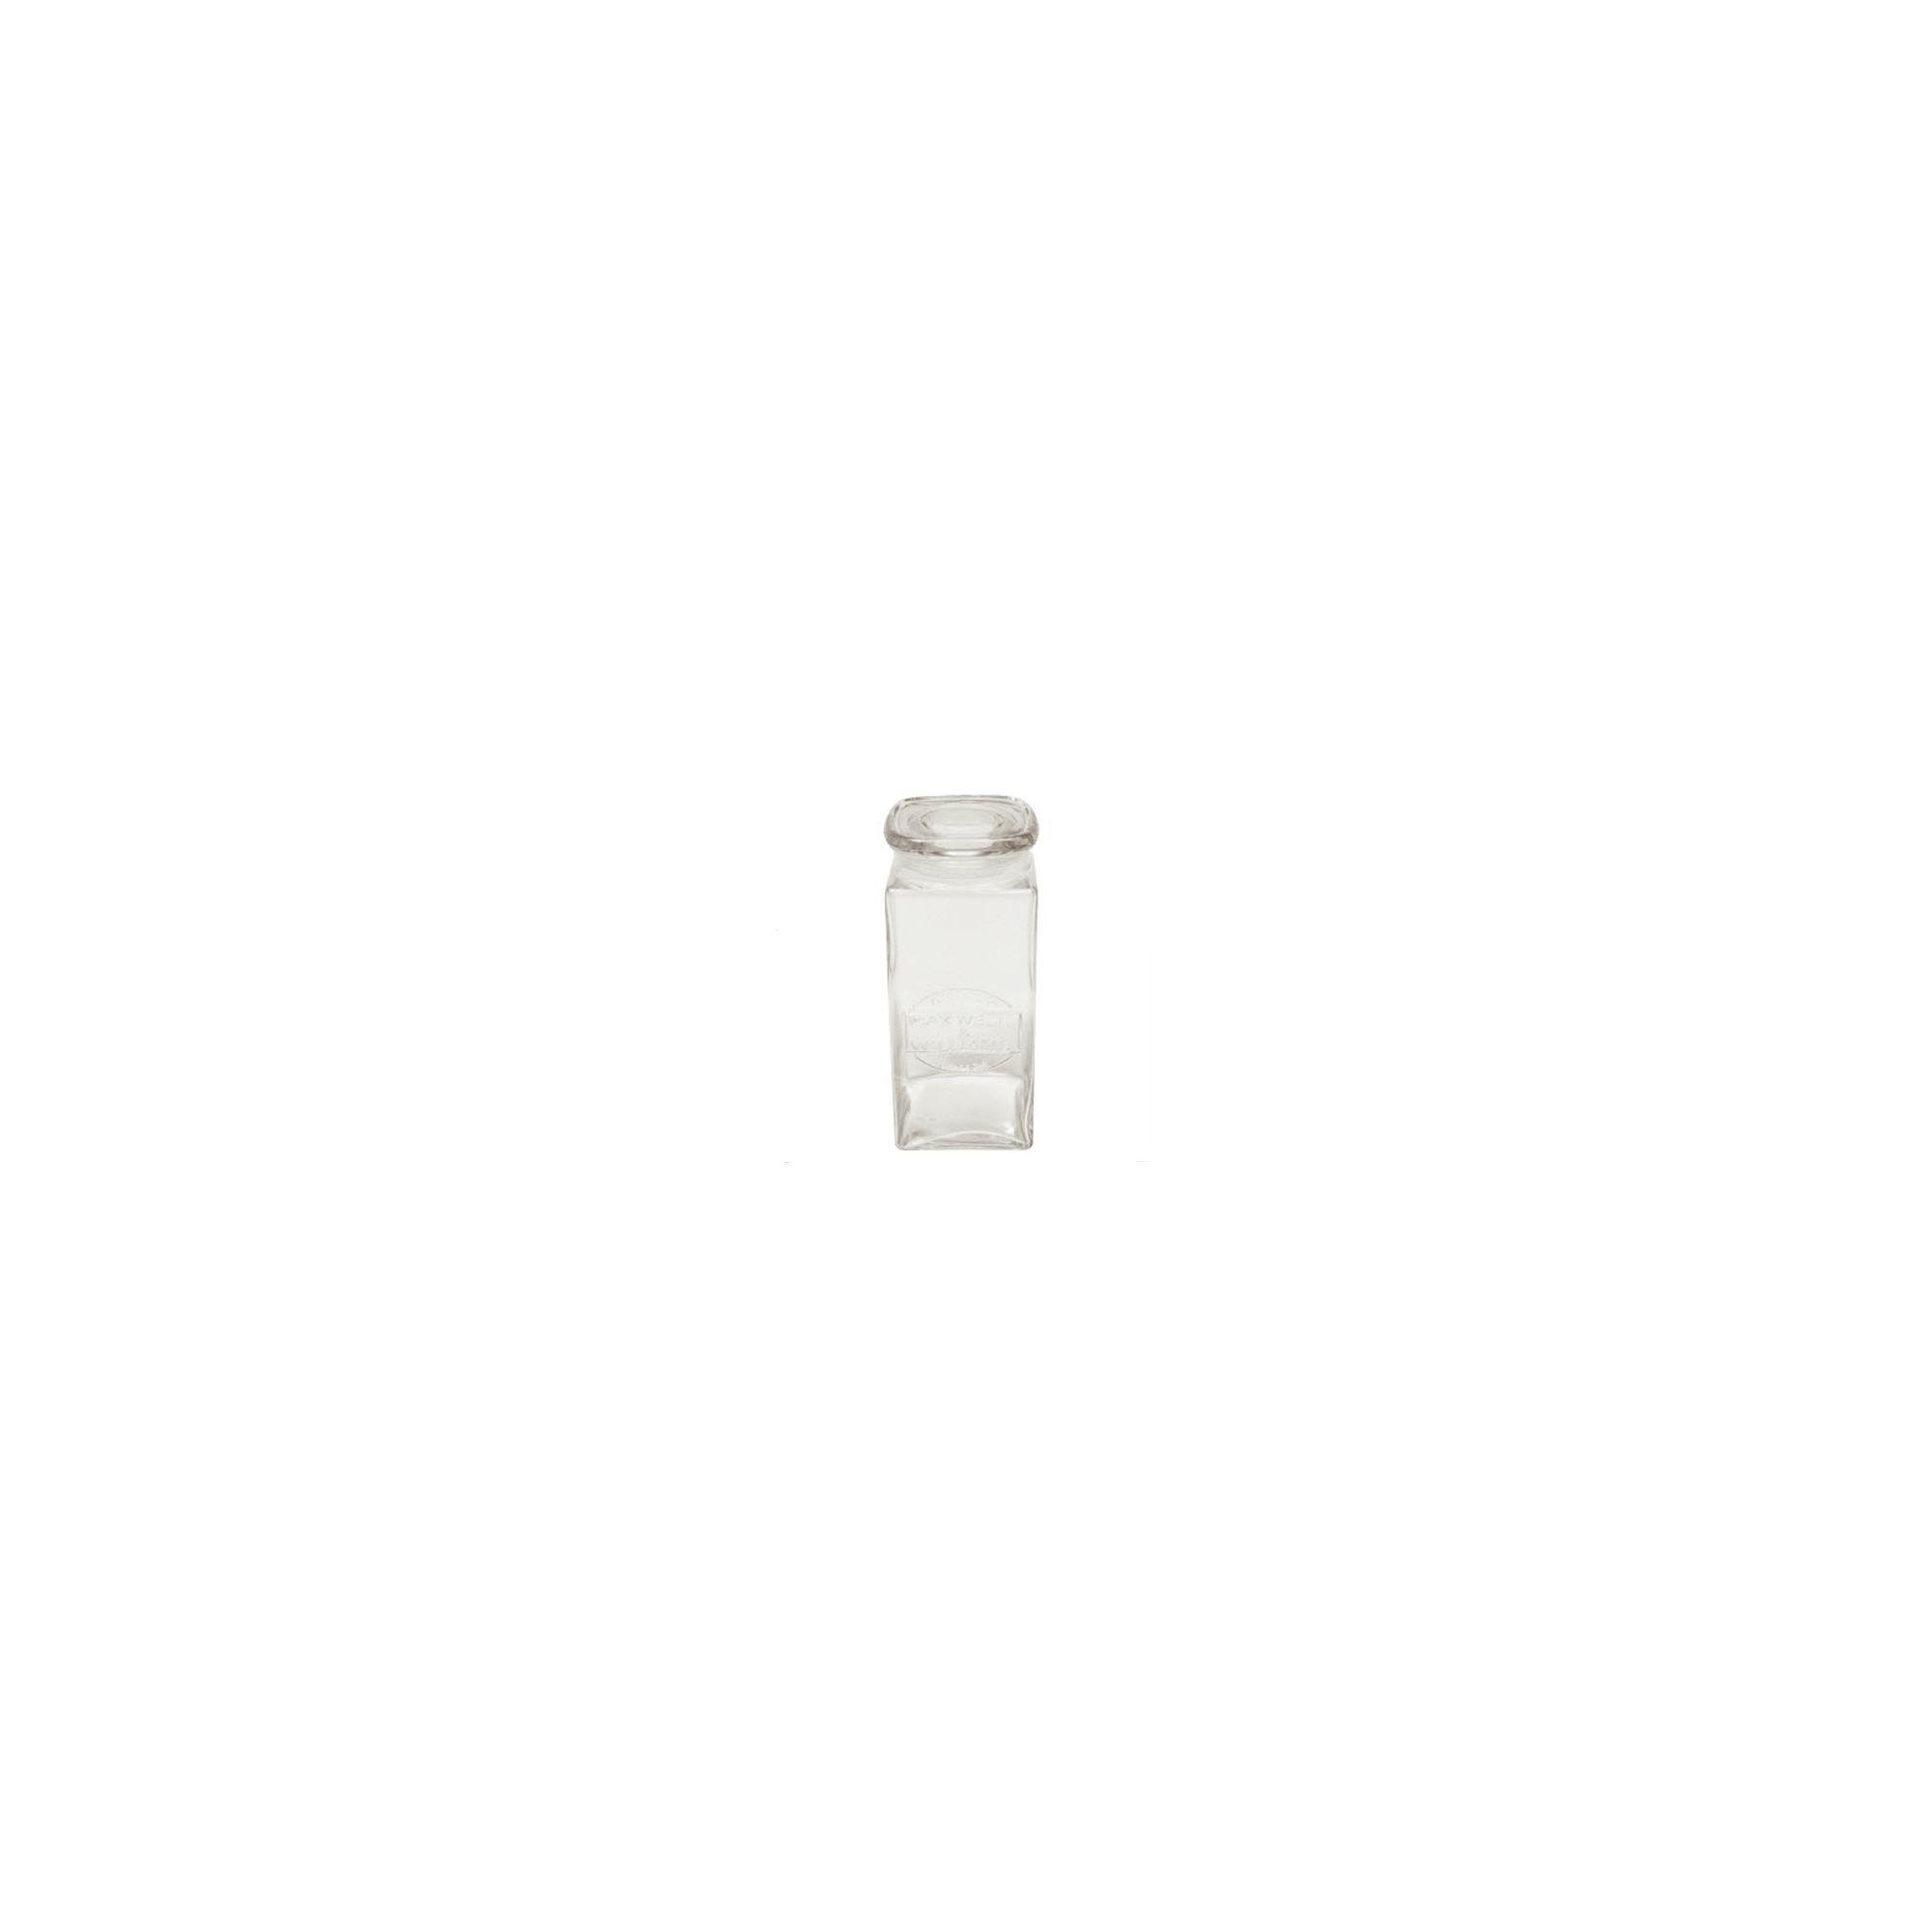 Maxwell and Williams 1.5 Litre Glass Storage Jar